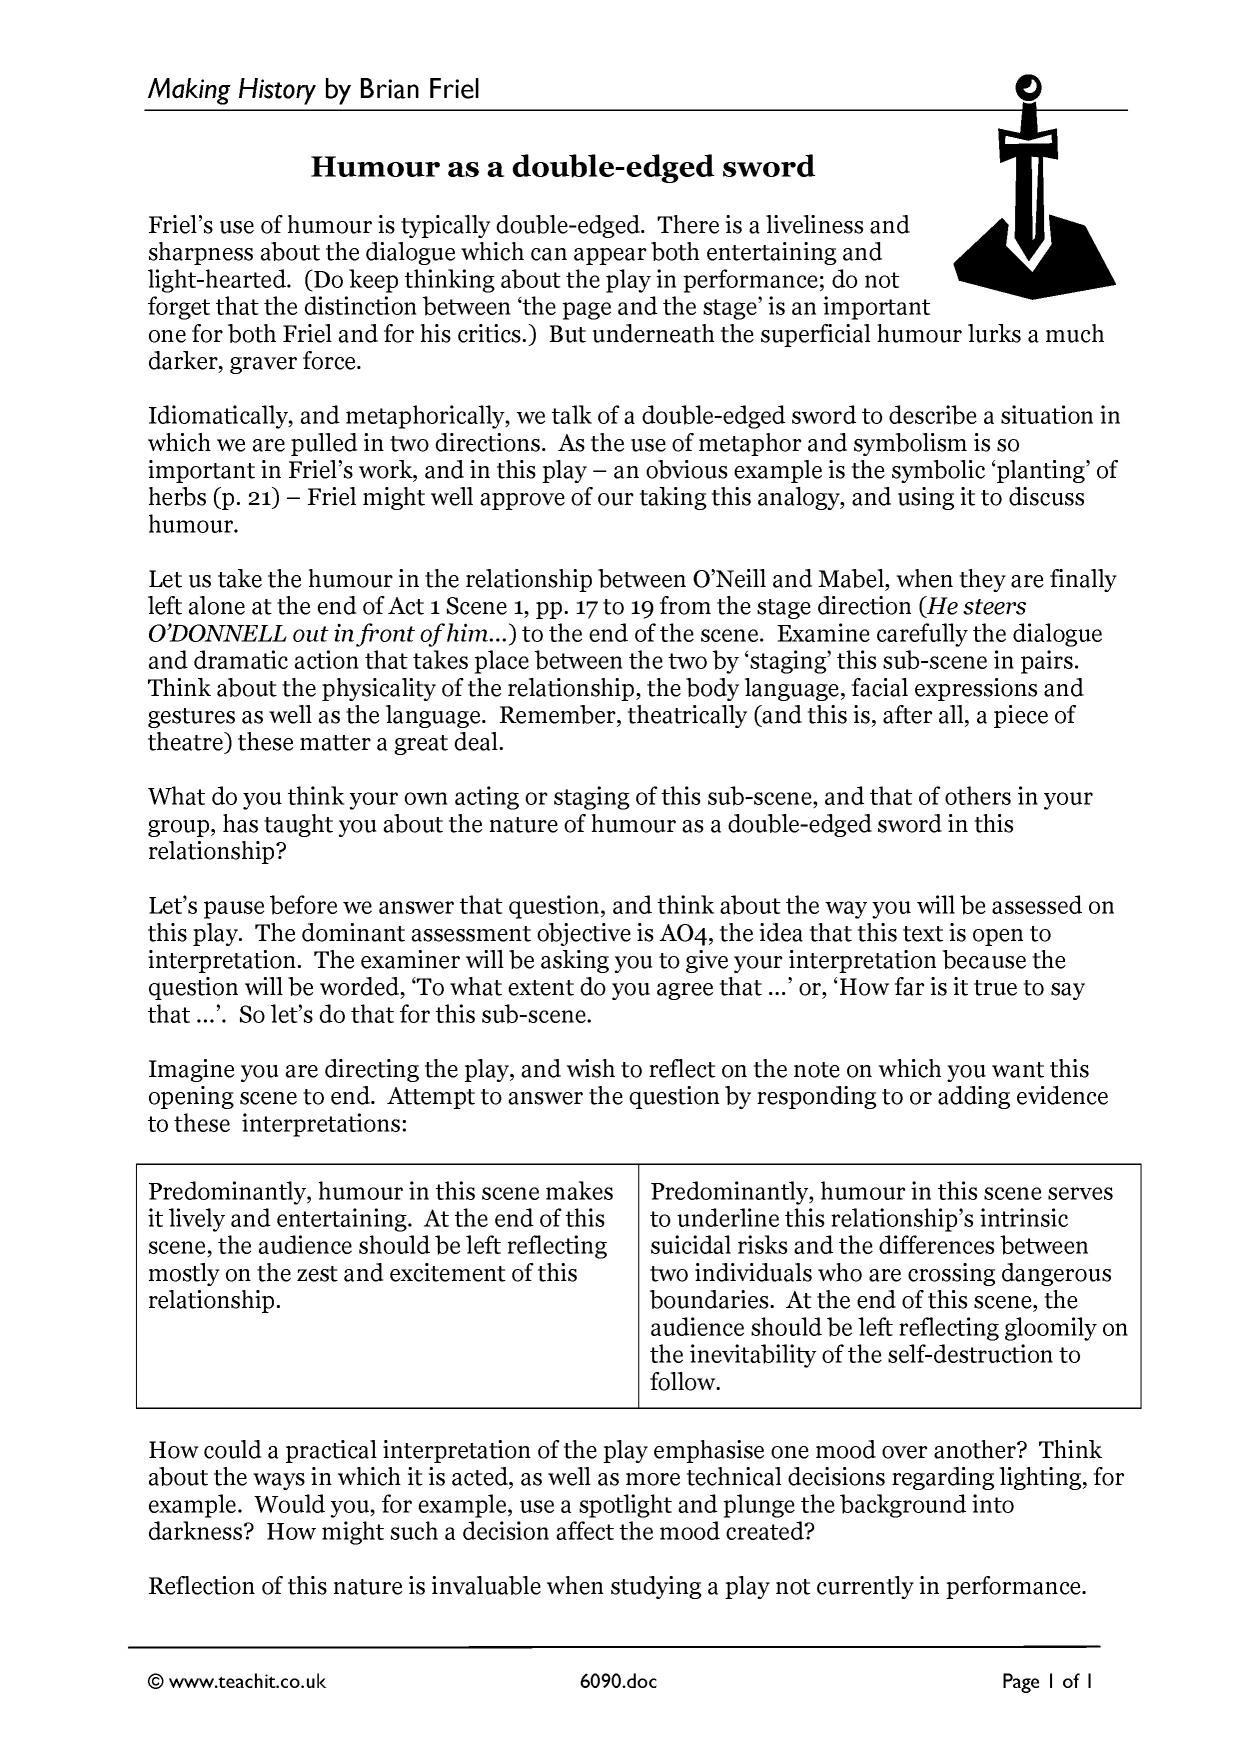 Comprende essay scholarships